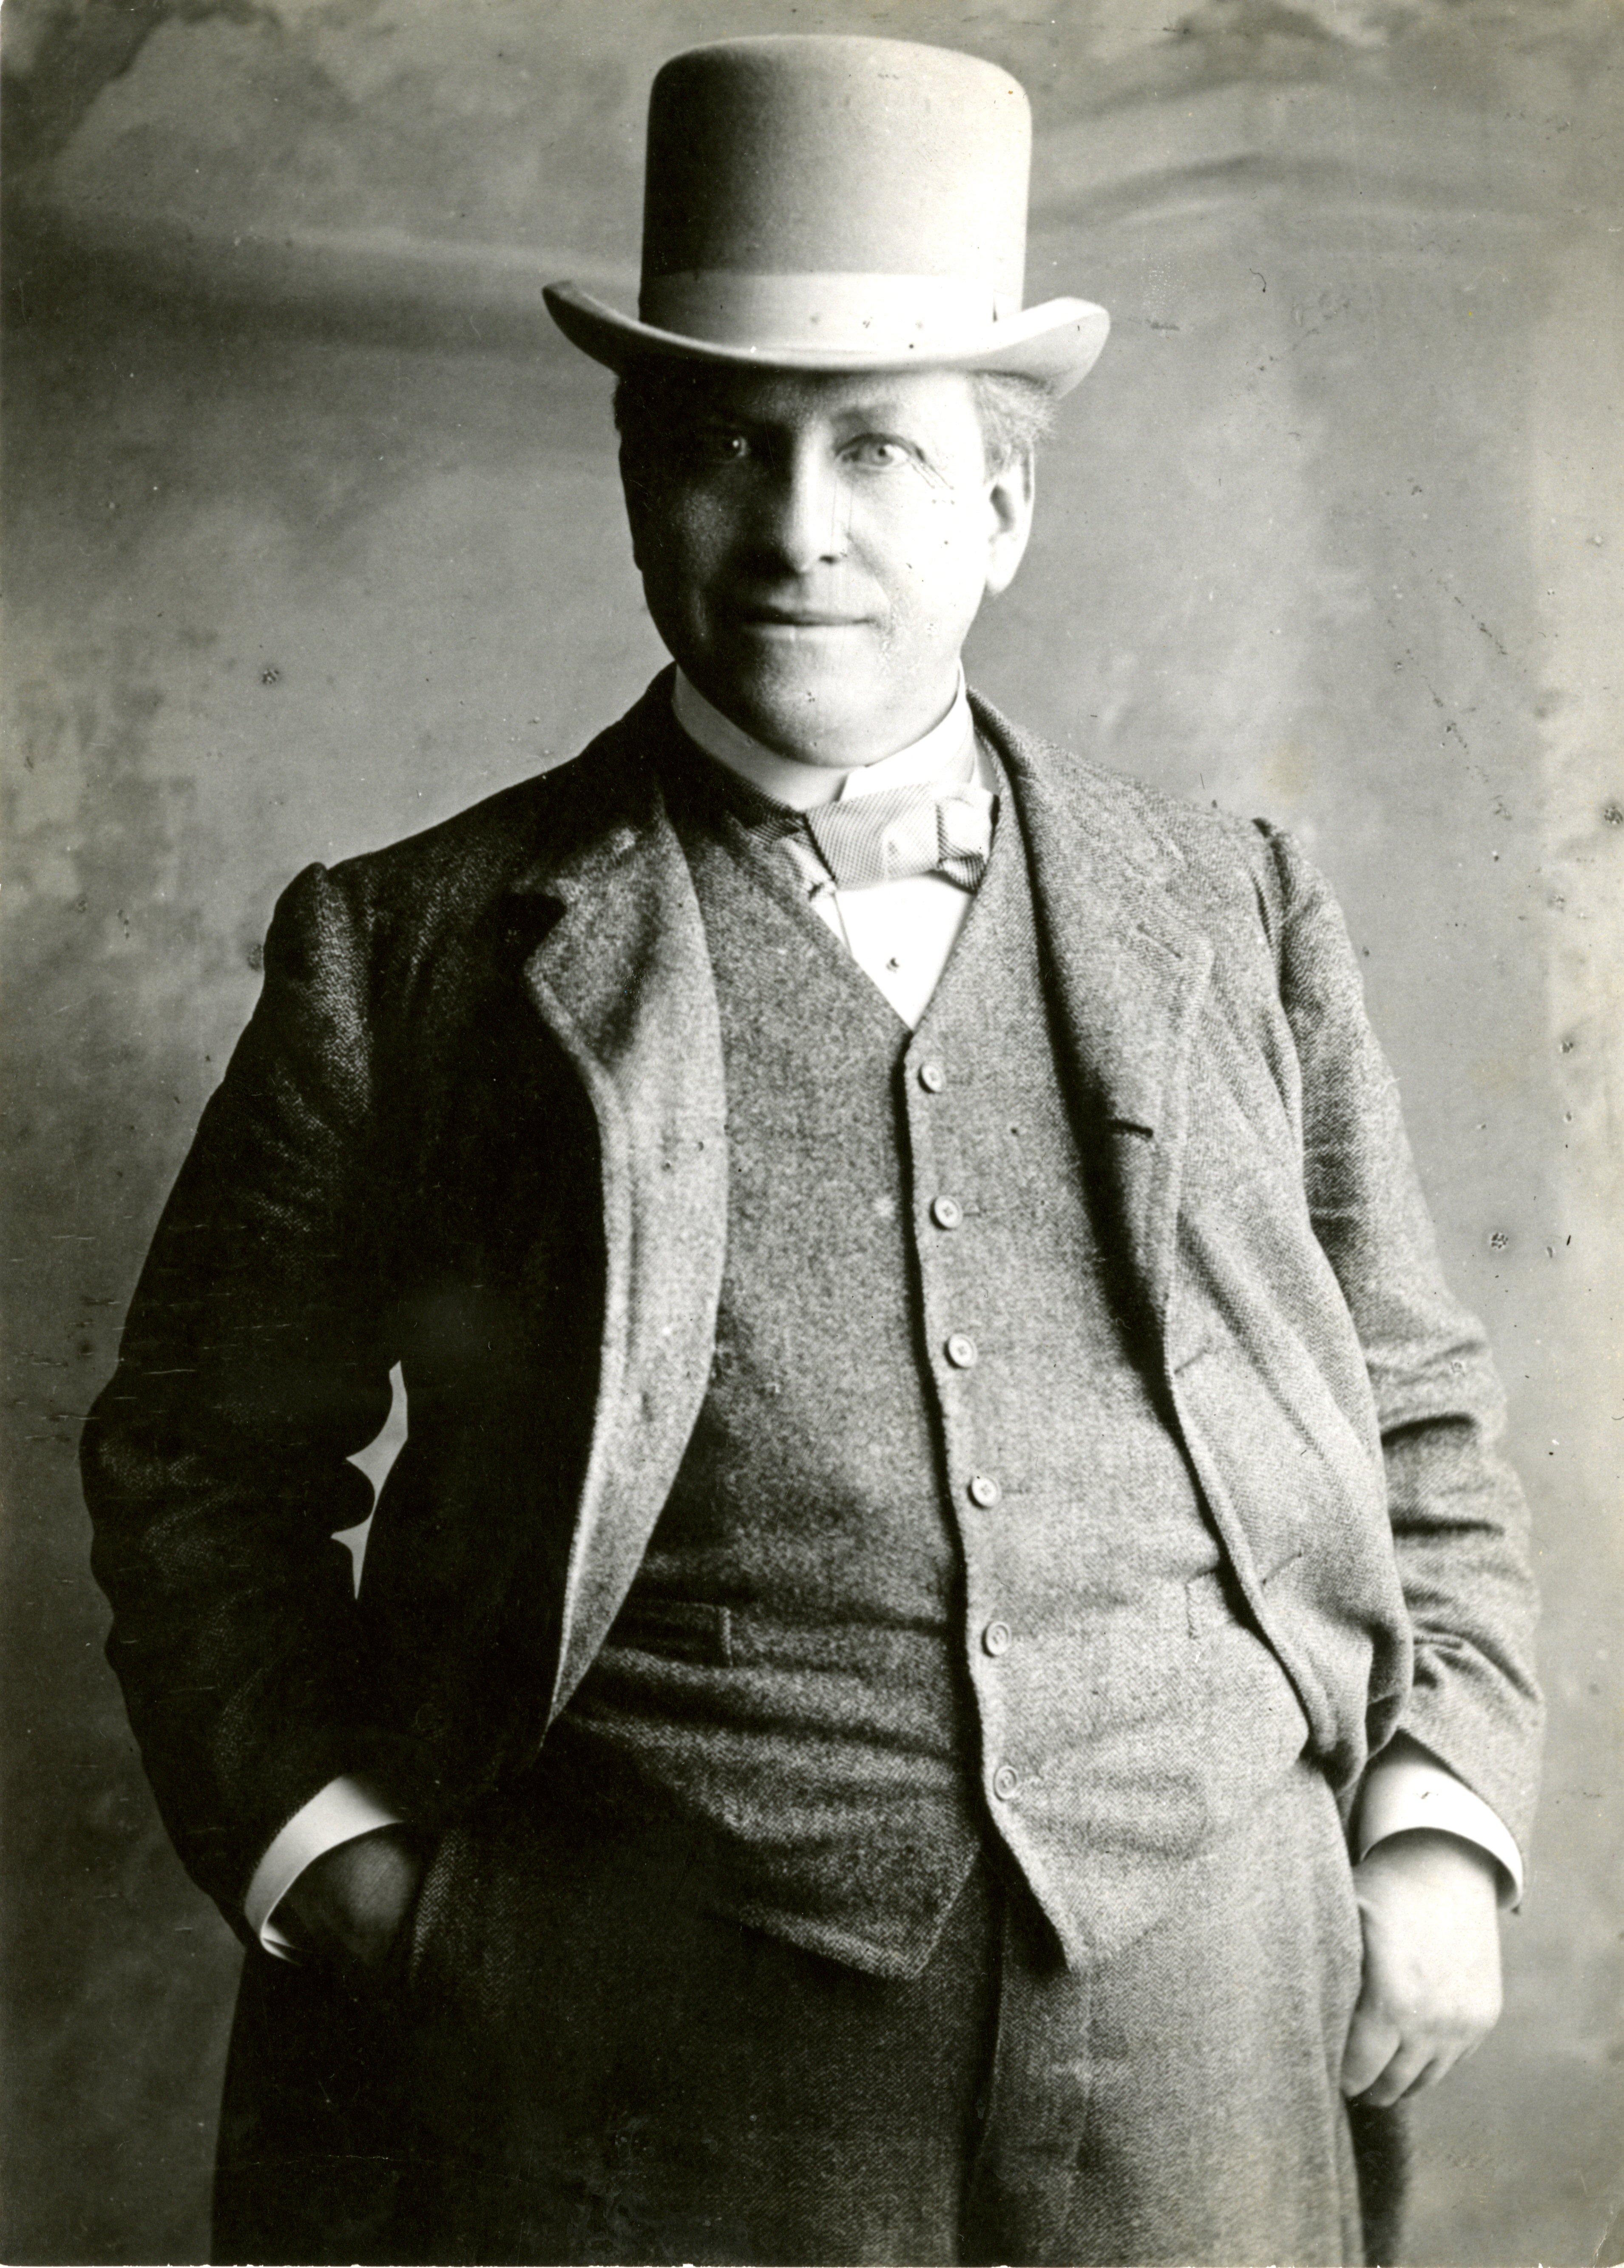 William Lever, Lord Leverhulme